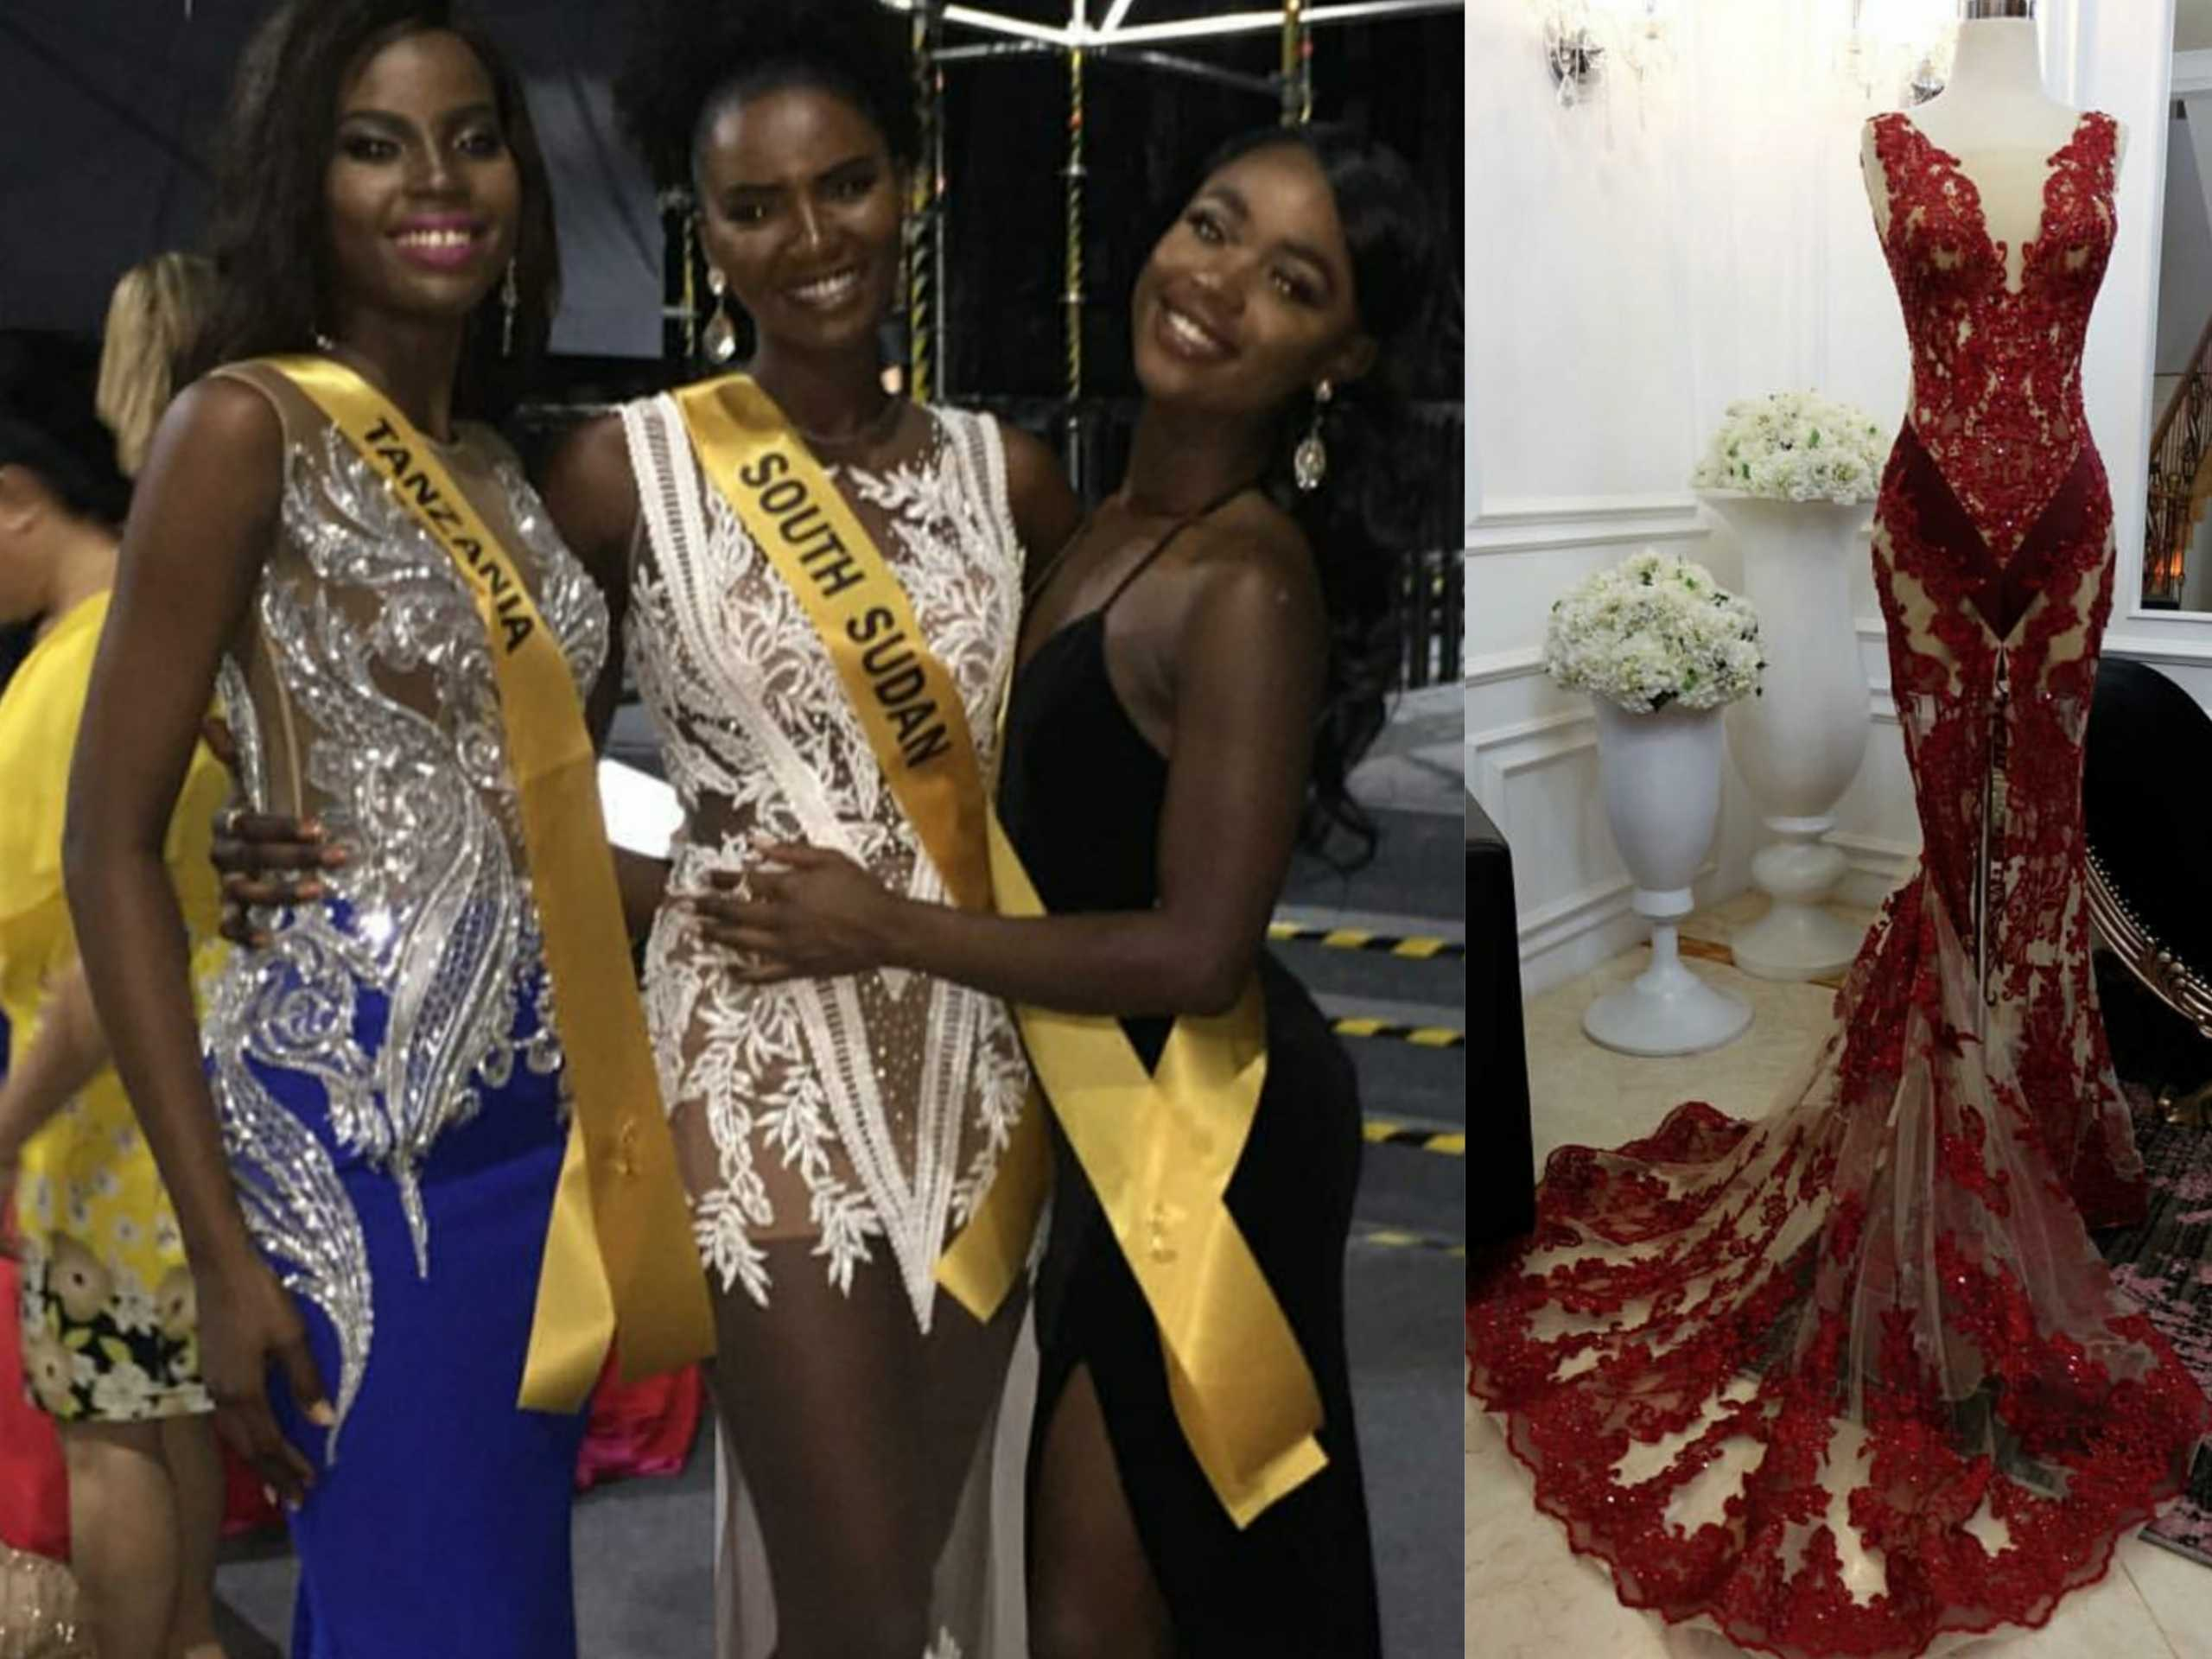 Miss Grand Tanzania mengenakan gaun perak-biru dari Anaz (kiri). Anaz menyiapkan gaun merah untuk Miss Grand Belgium (kanan). (Sumber: Instagram/anazofficial)